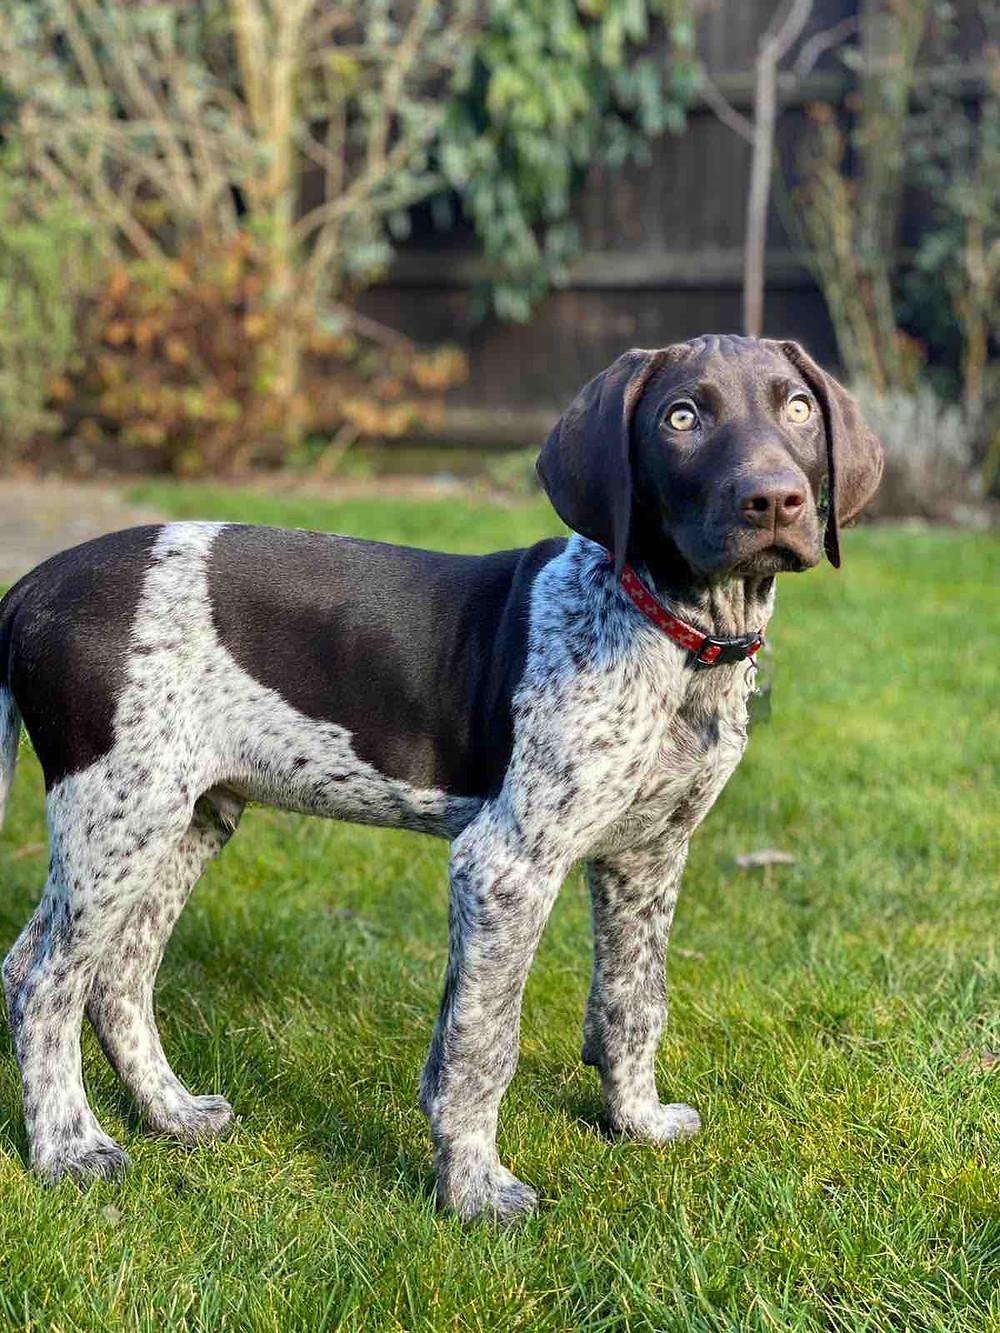 A German short haired pointer dog in the garden